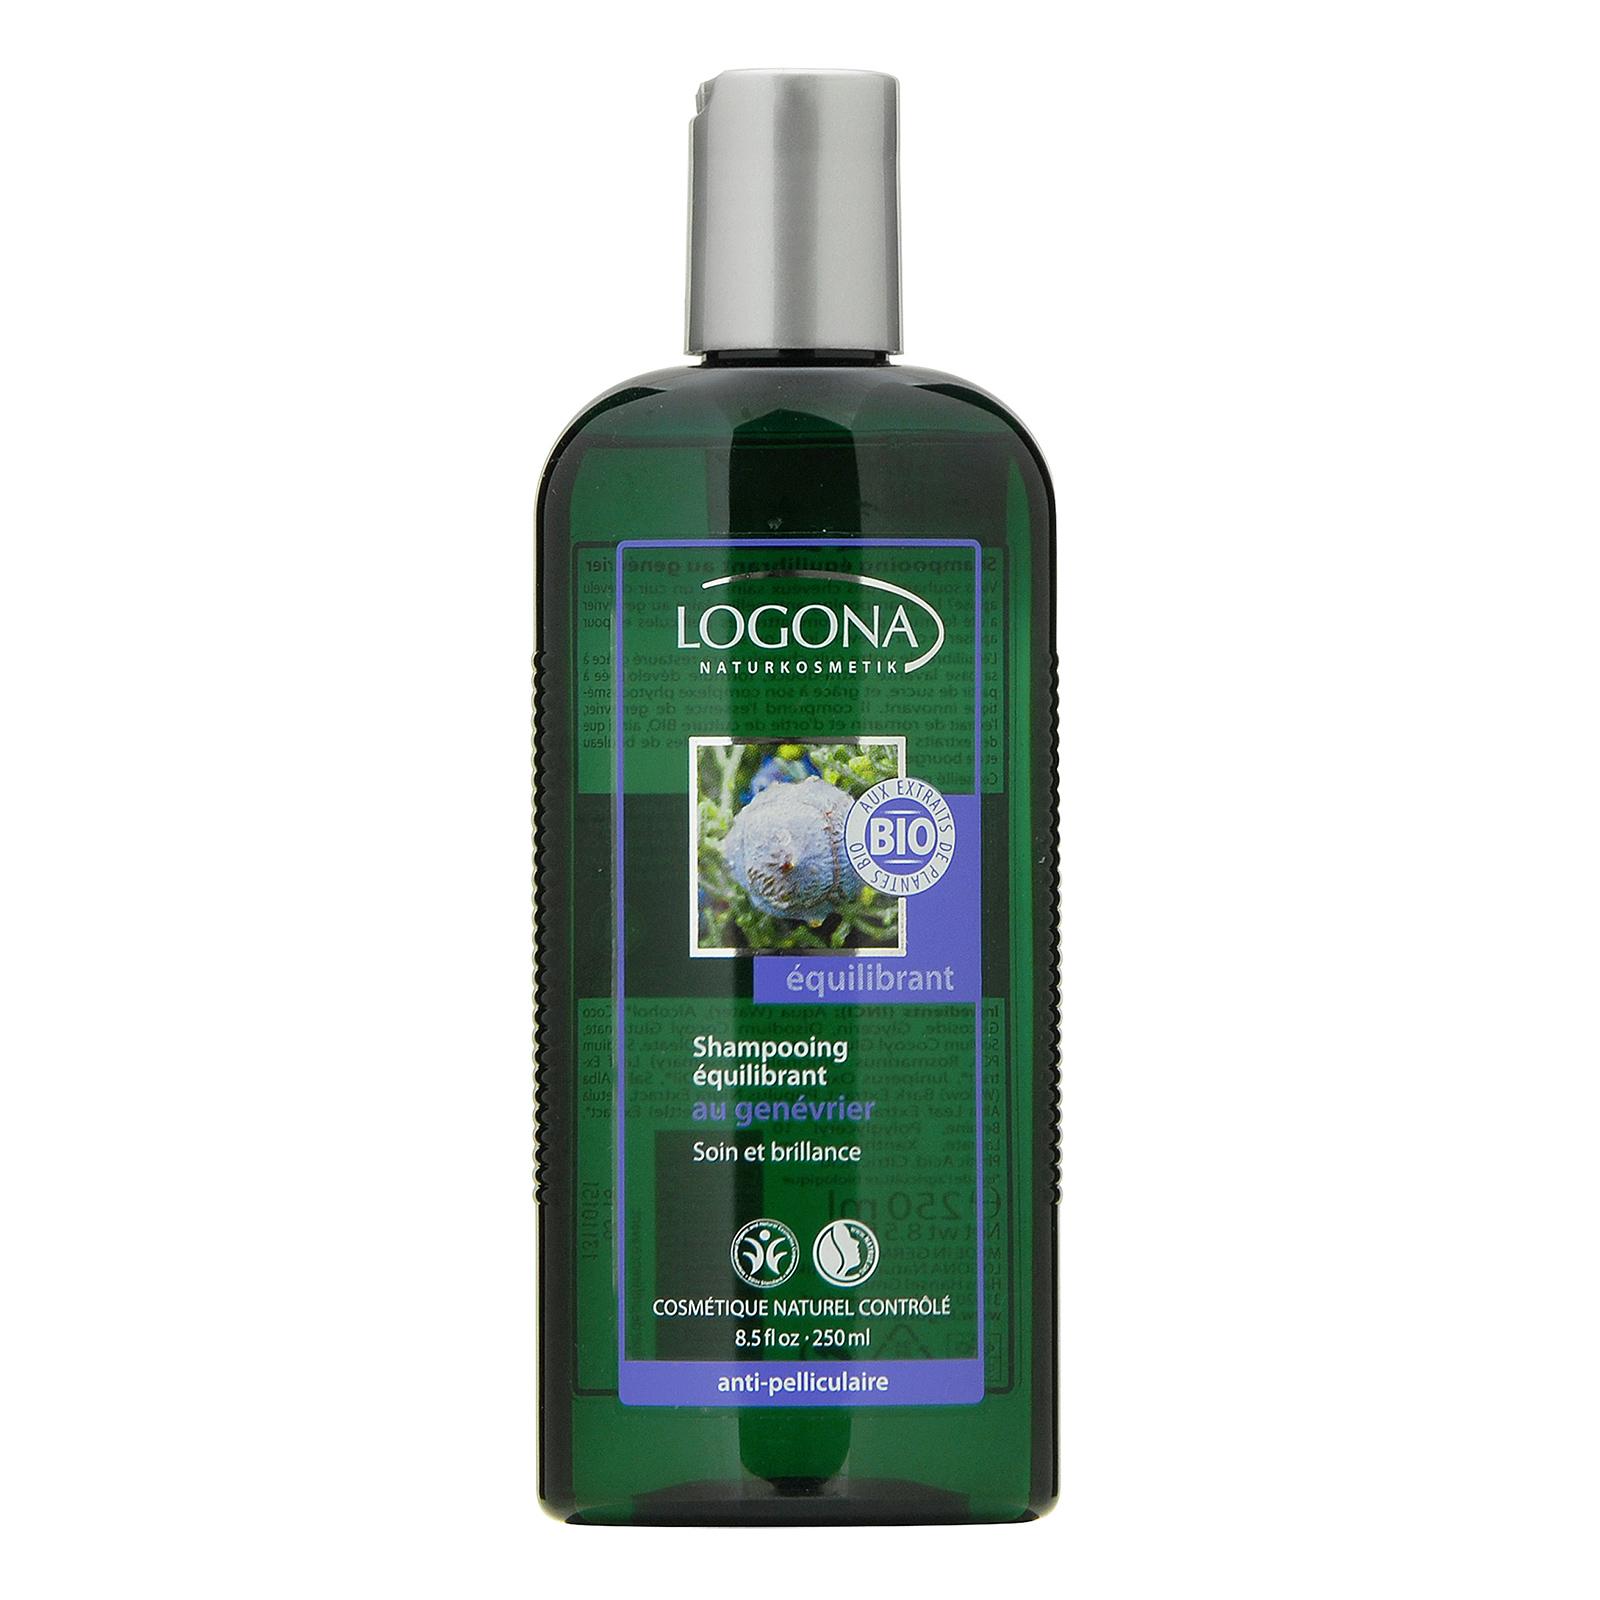 LOGONA  Juniper Oil Anti-Dandruff Shampoo 8.5oz, 250ml